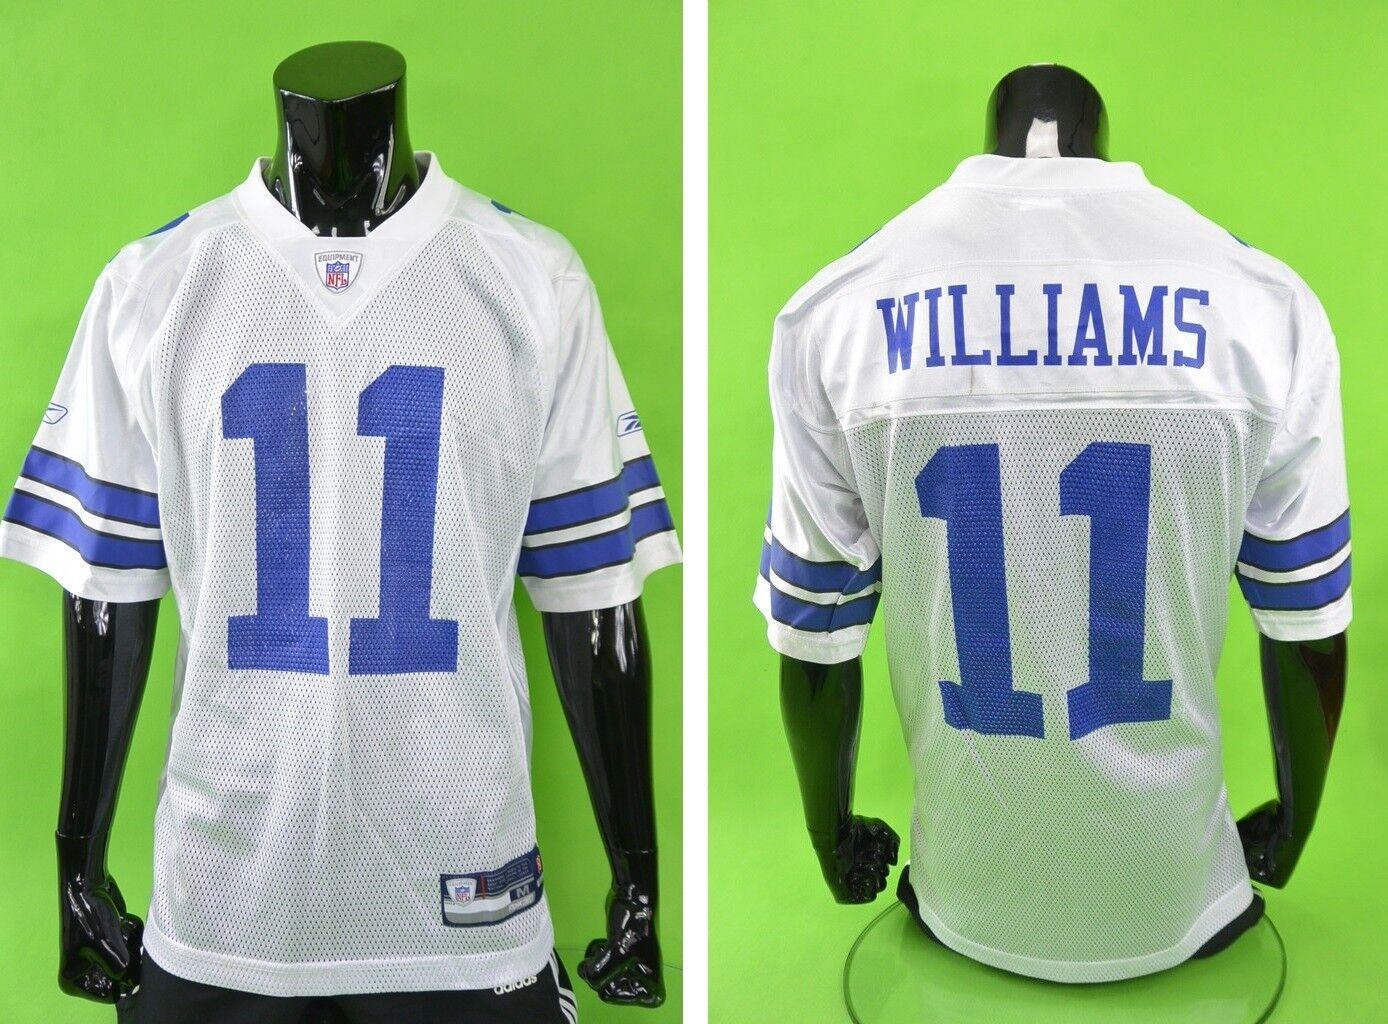 Reebok Dallas Cowboys WILLIAMS 11 NFL Mens American Football Jersey Shirt SIZE M